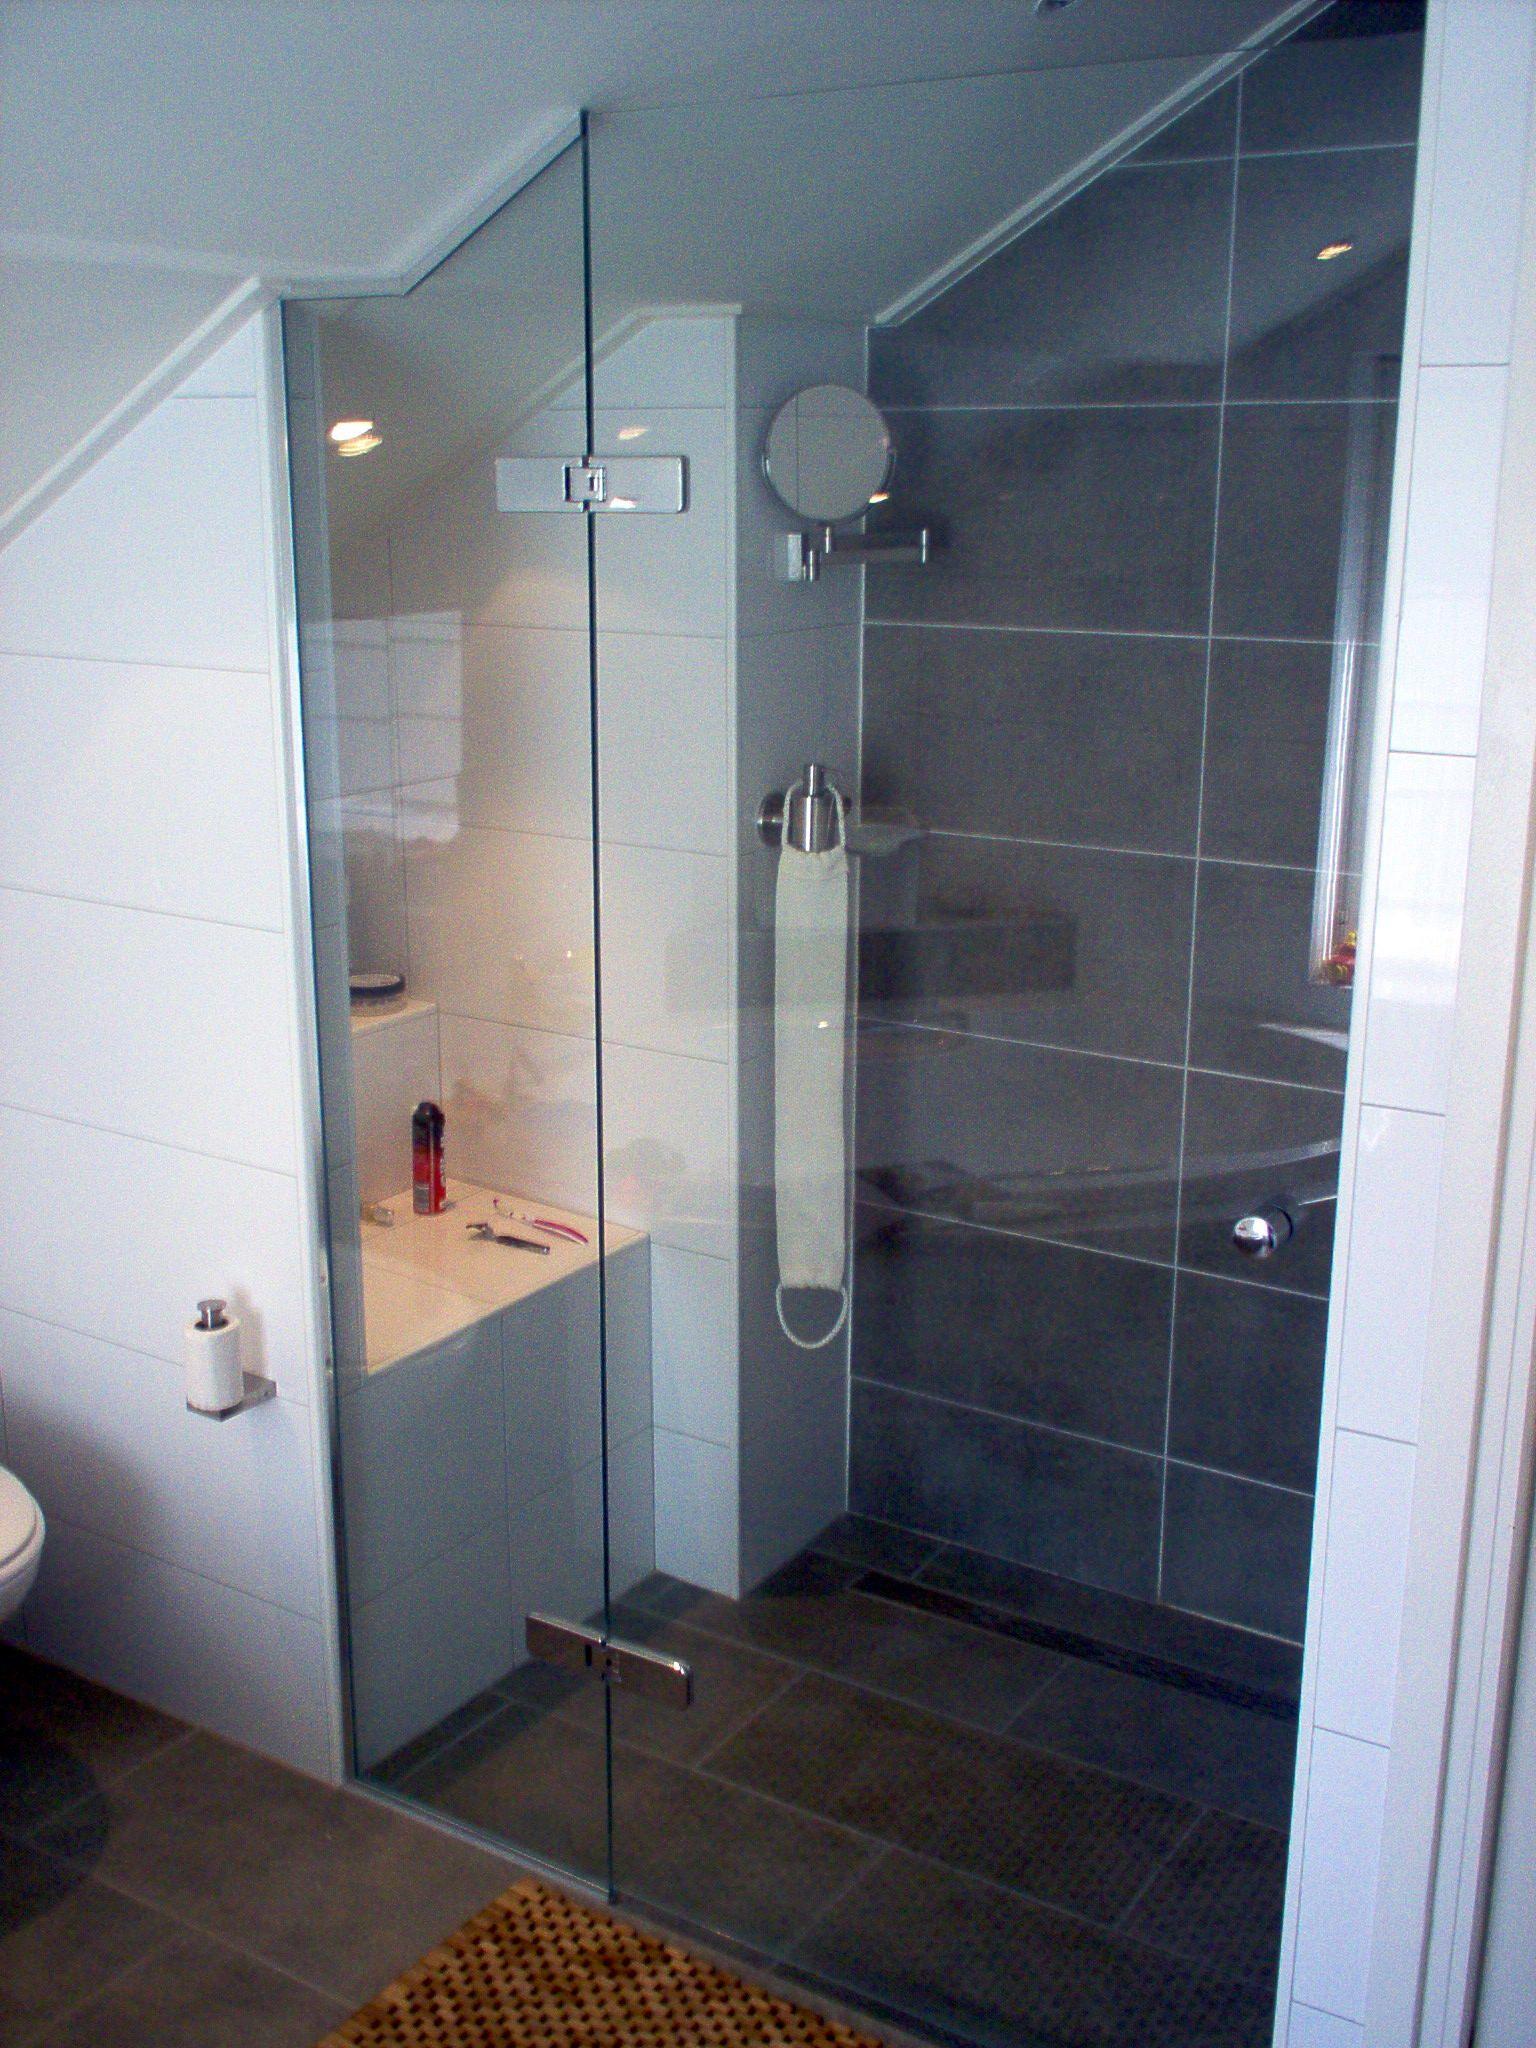 Pin By Donald Ogillo On Don Small Attic Bathroom